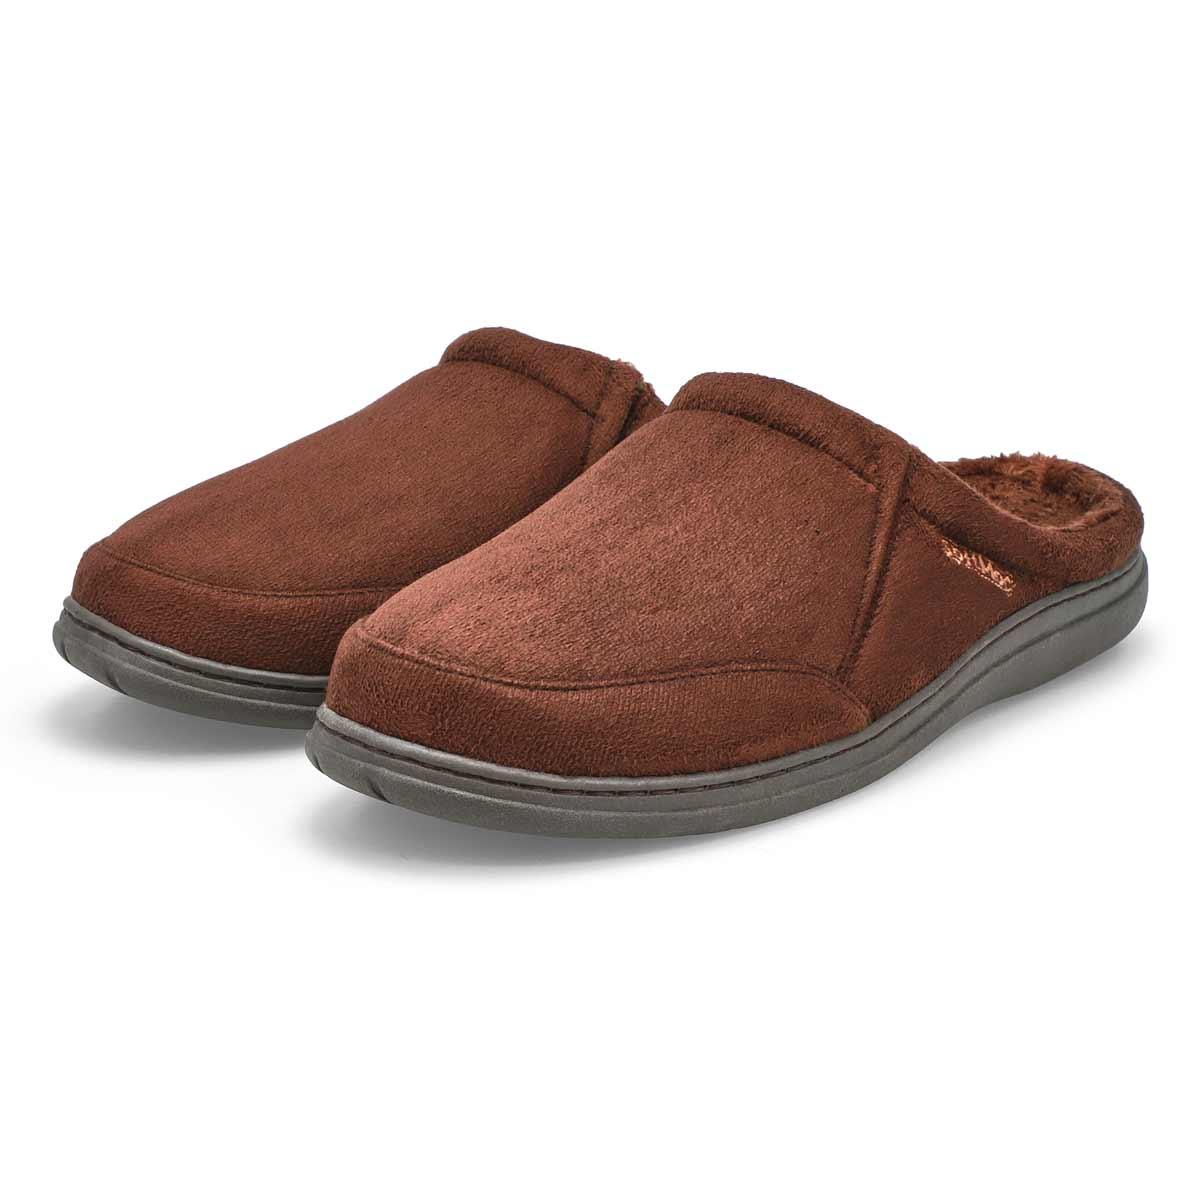 Pantoufle microsuède POLAR II, brun, hom